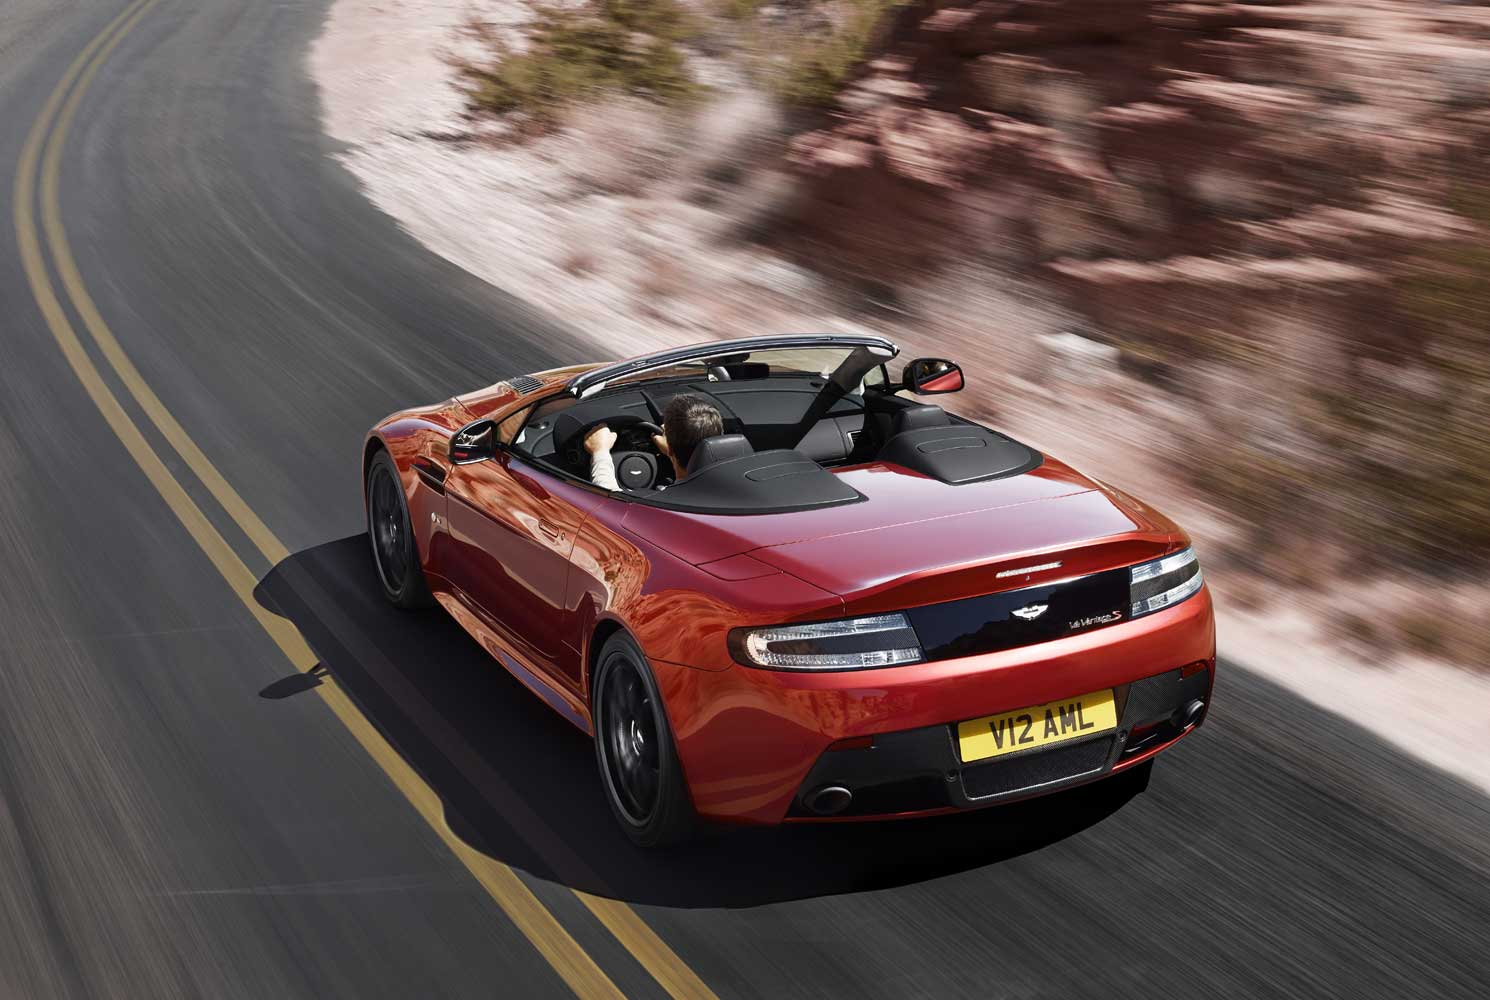 2014 Aston Martin V12 Vantage S Roadster 30